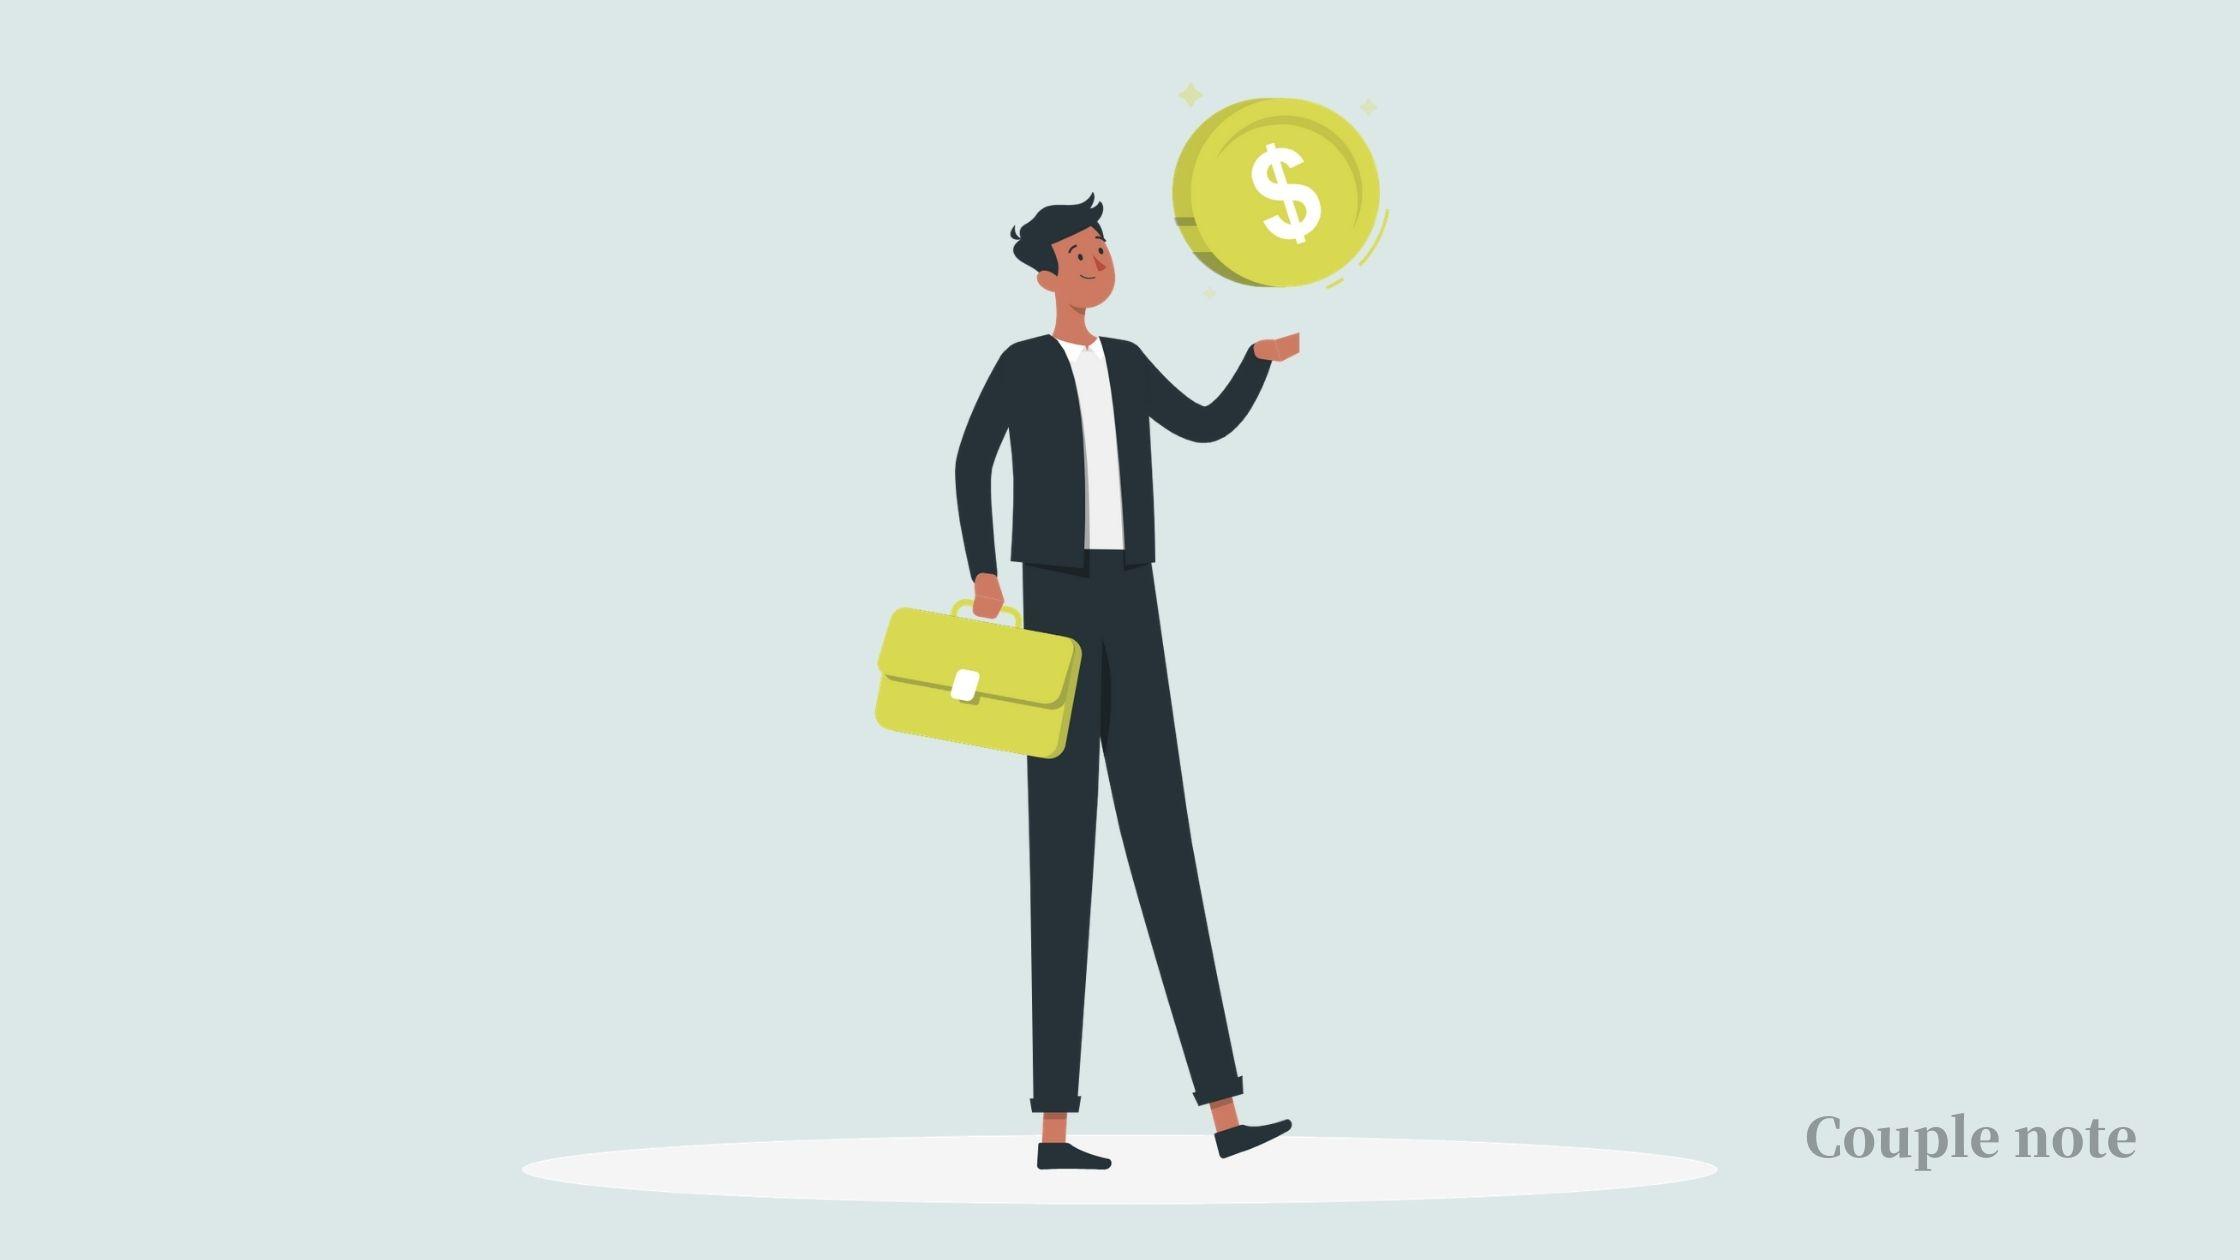 Codoc|Wordpressの記事を有料販売する方法【投げ銭あり】